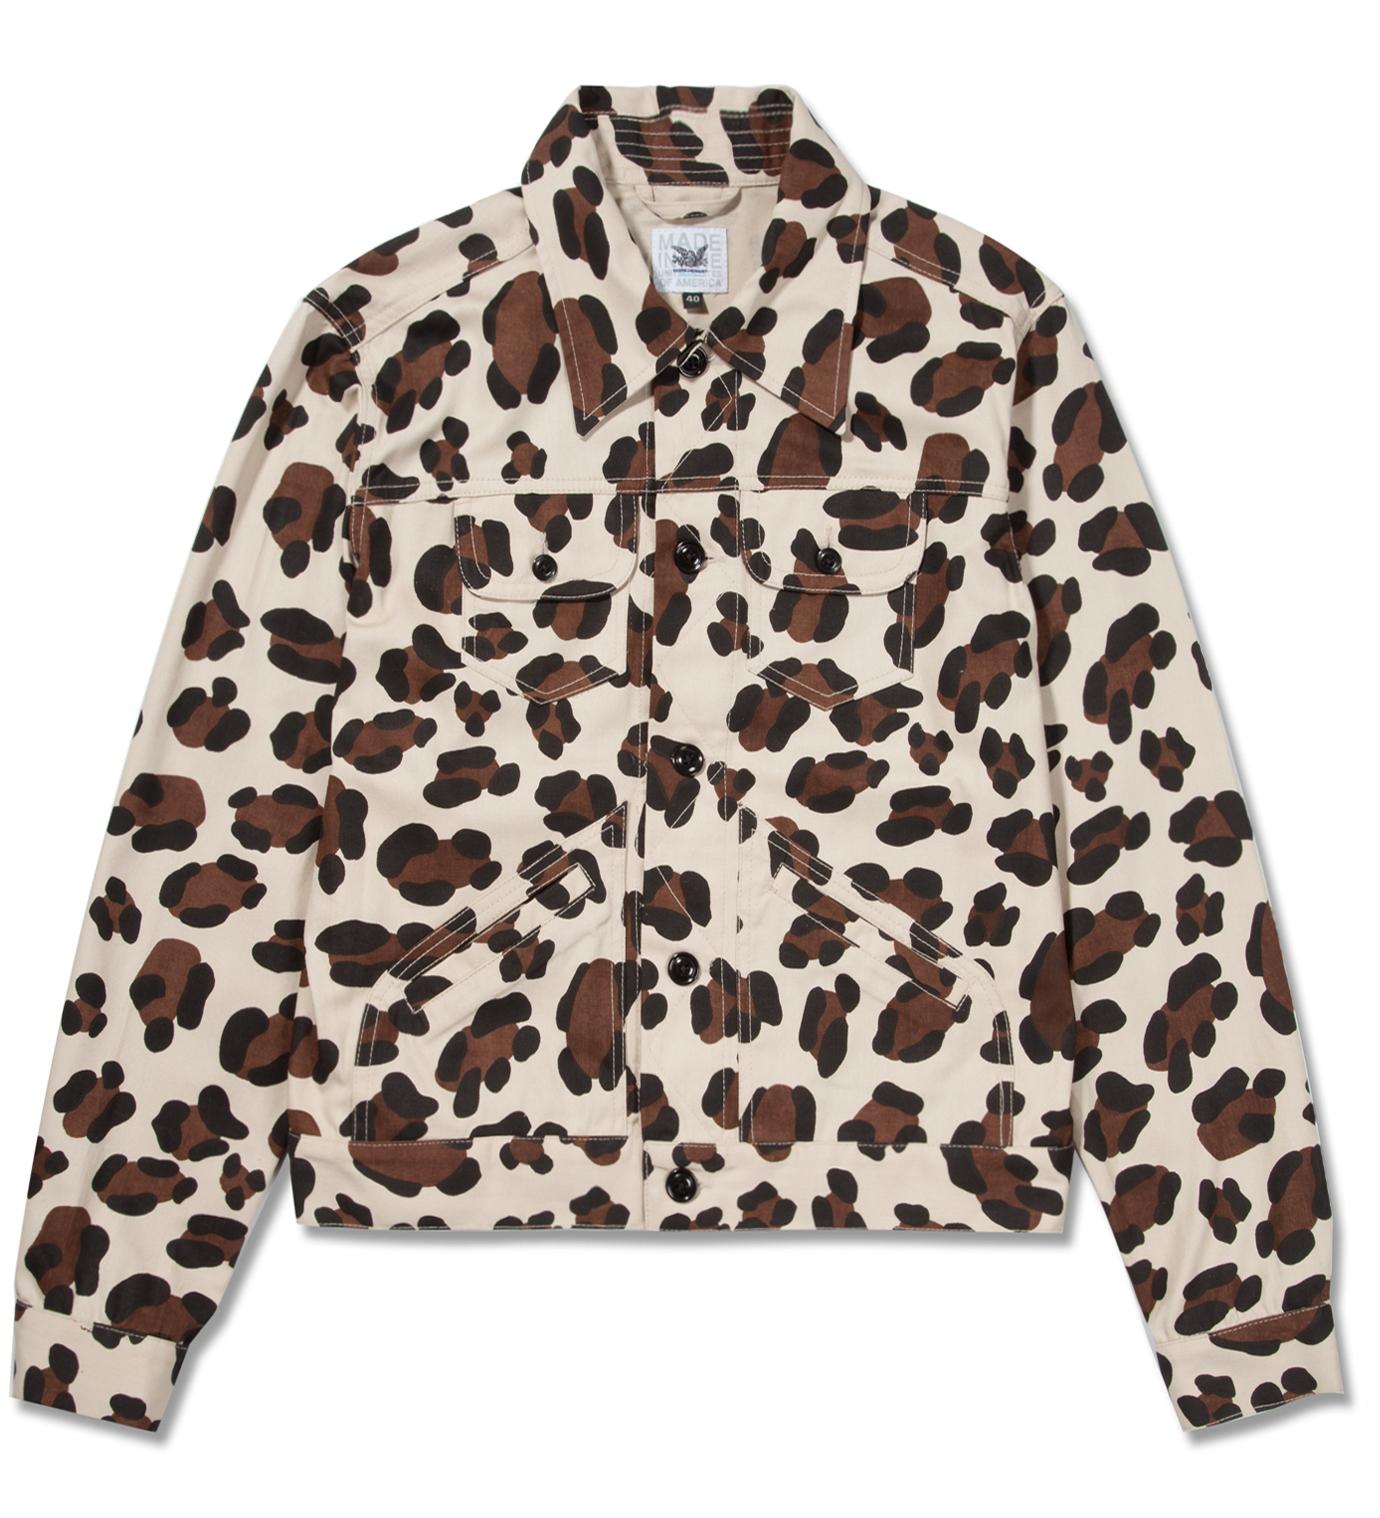 Mark McNairy Leopard Jean Jacket